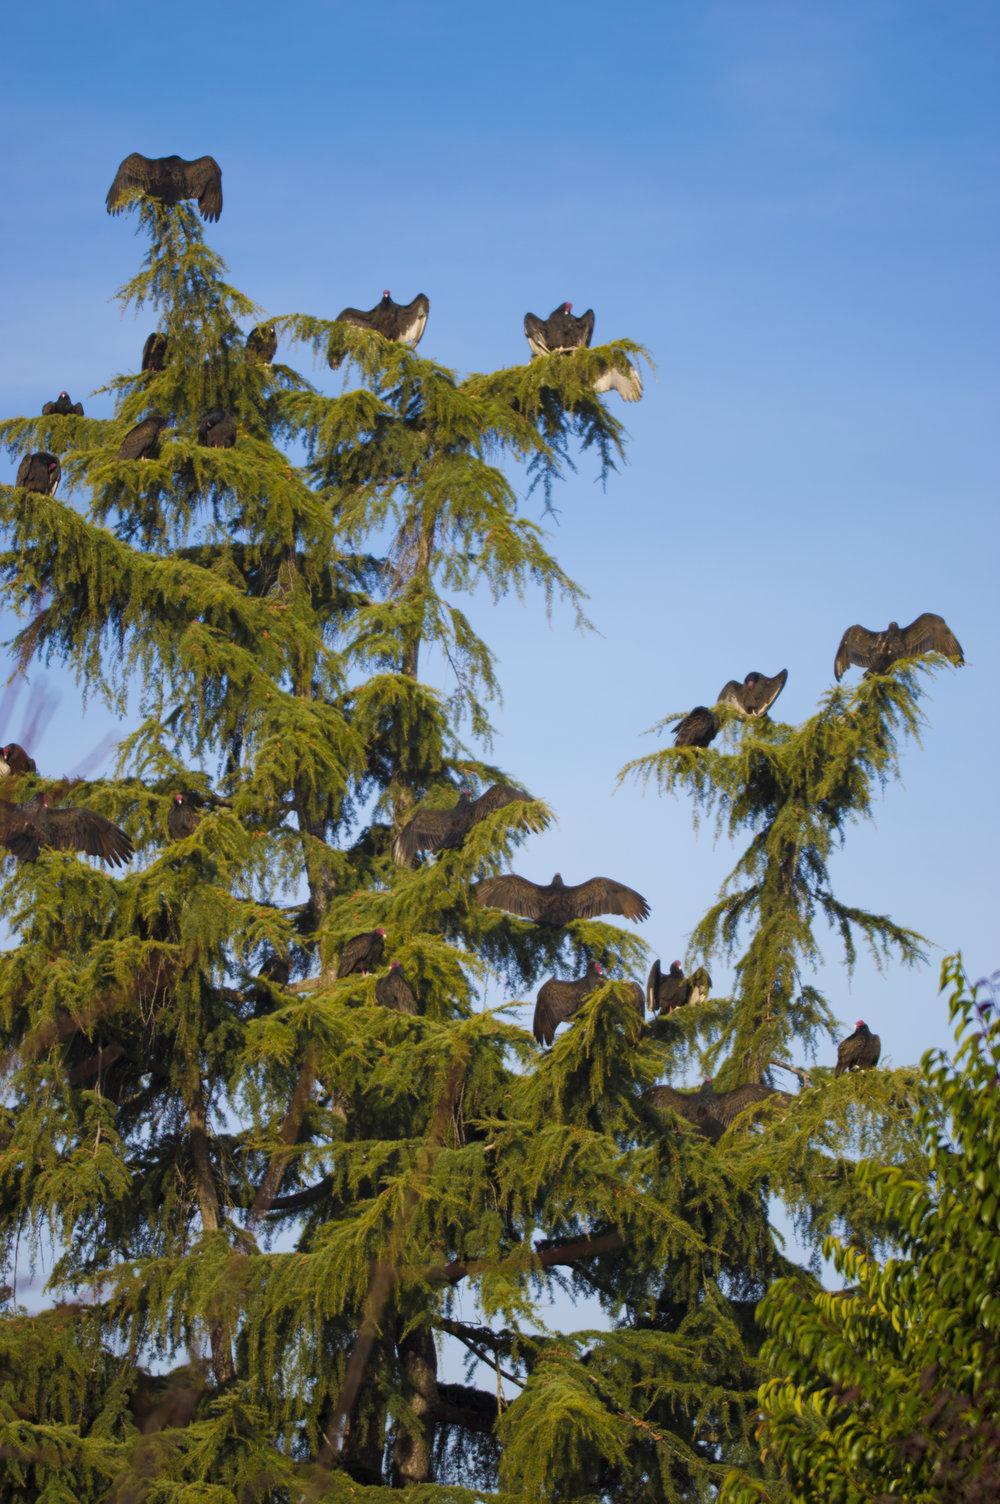 Turkey Vultures in San Jose, California